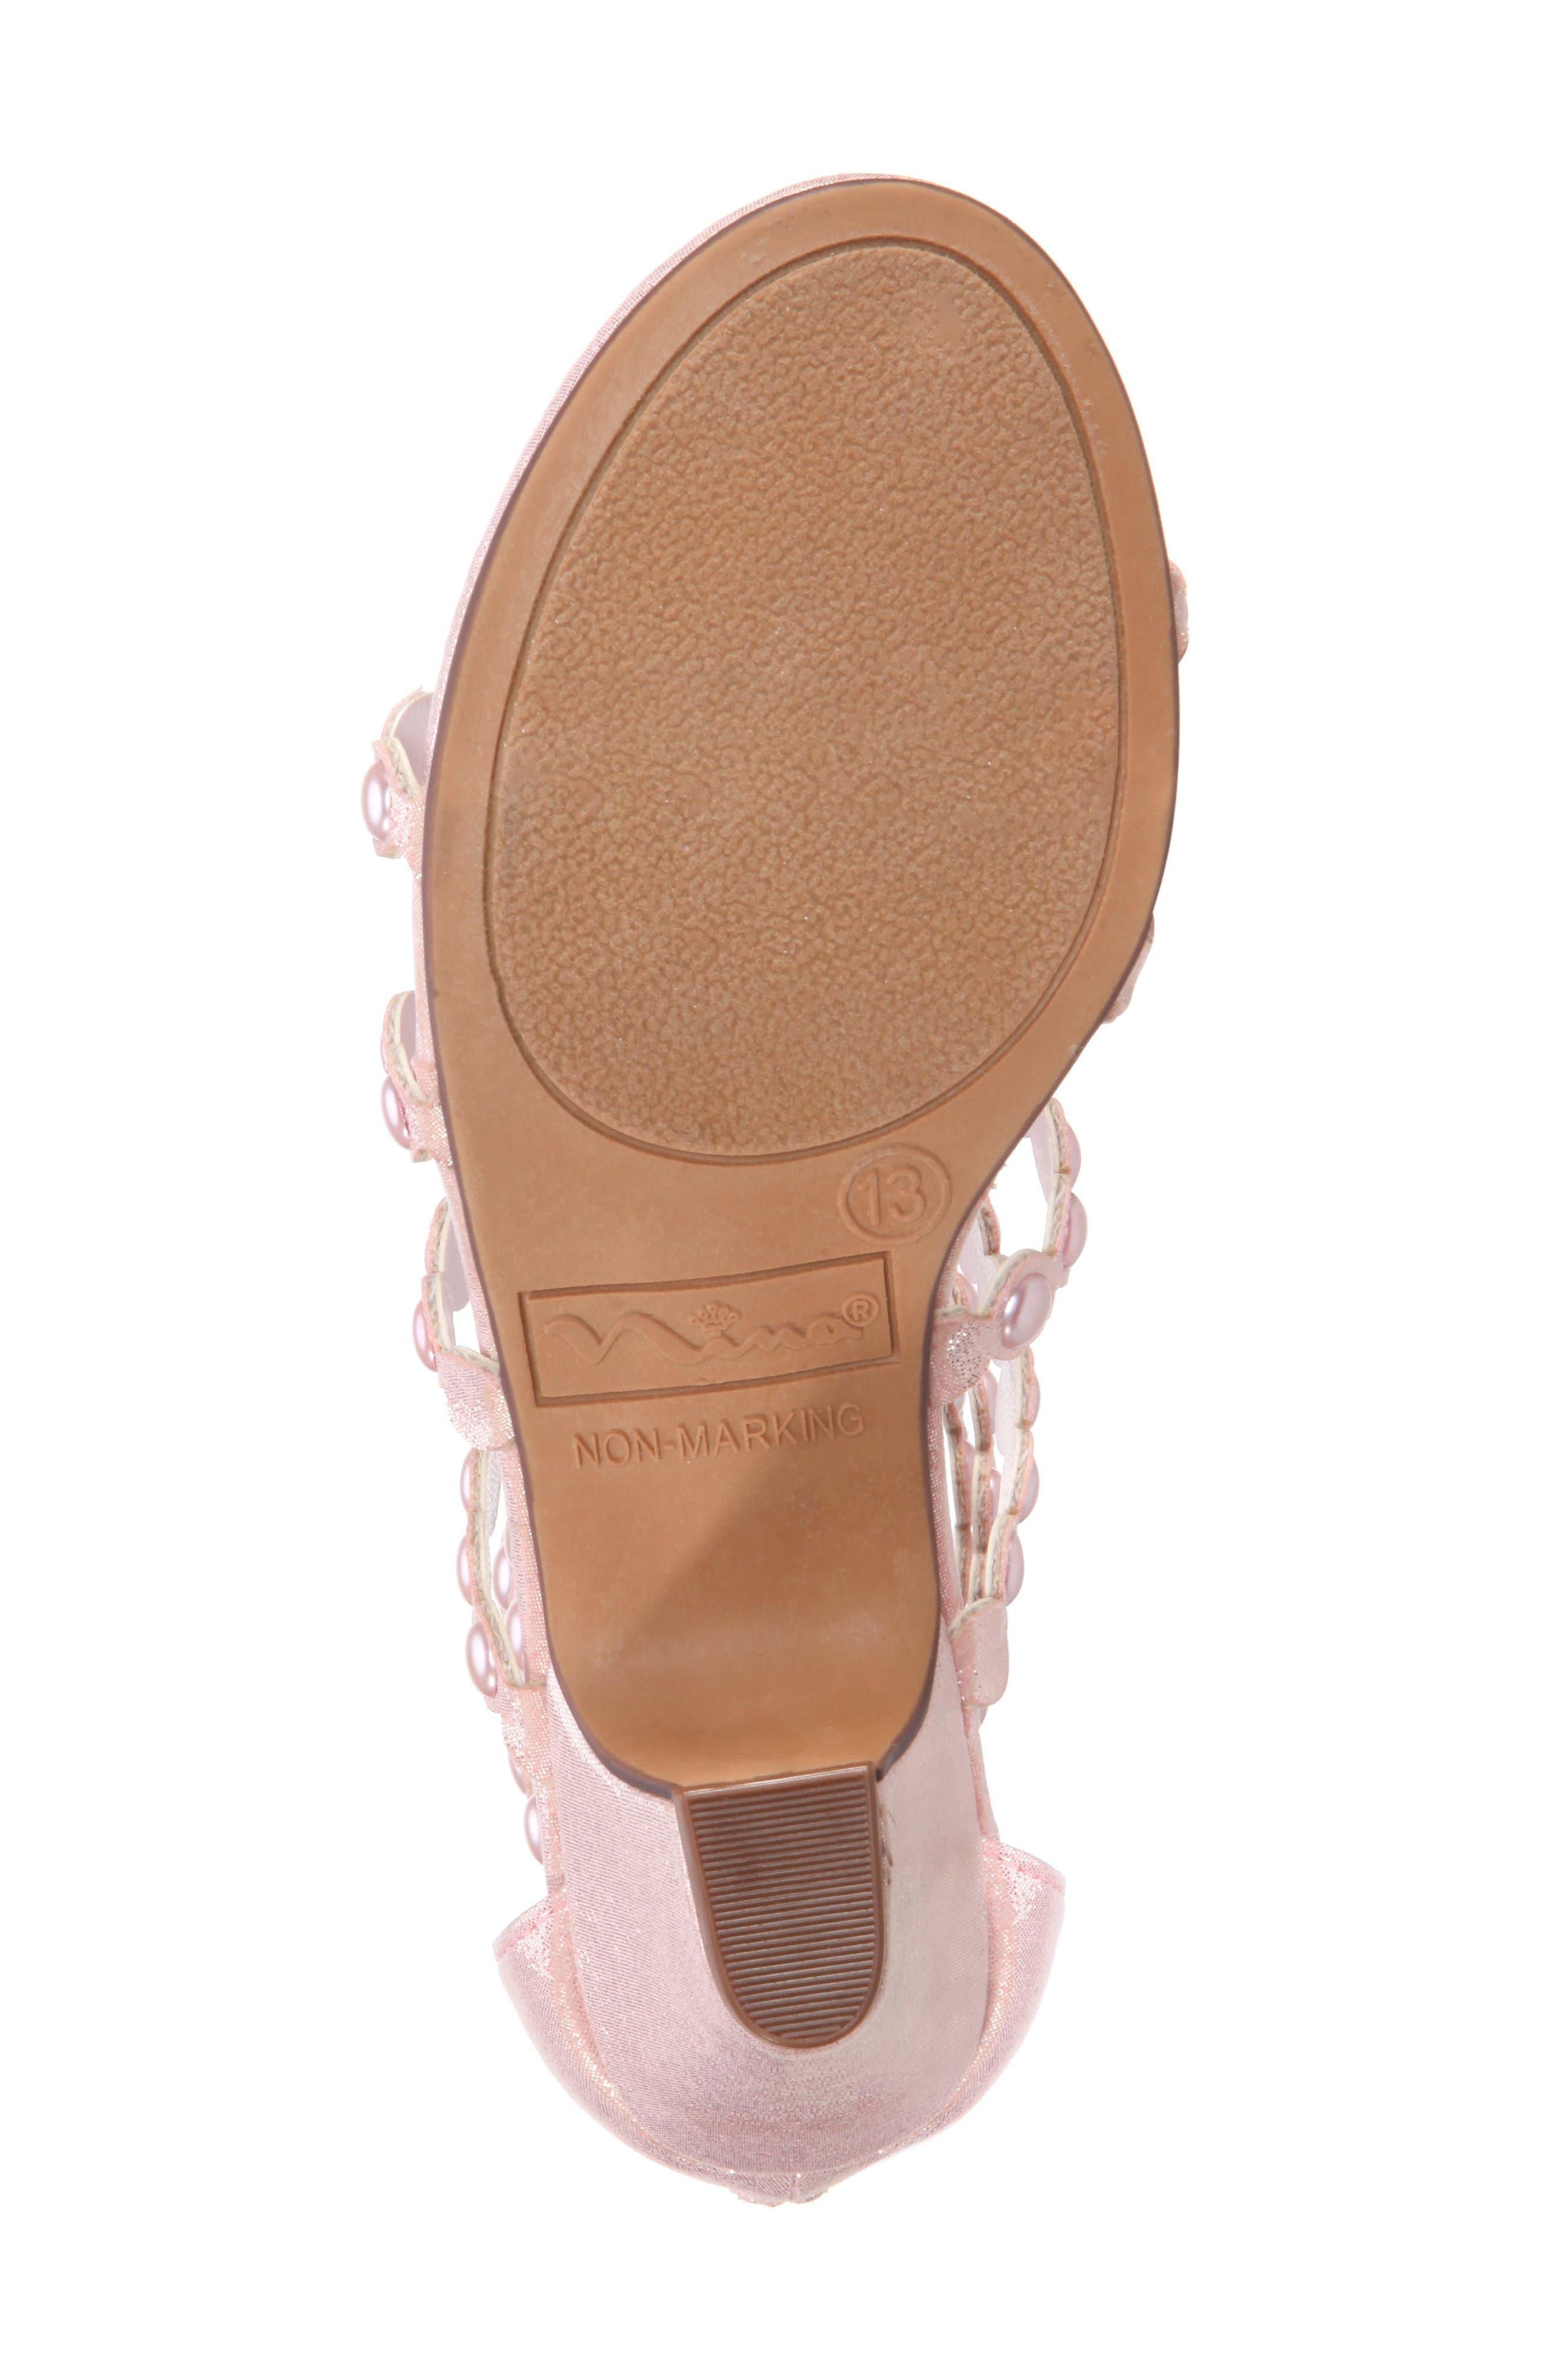 Princess-P Shimmer Sandal,                             Alternate thumbnail 16, color,